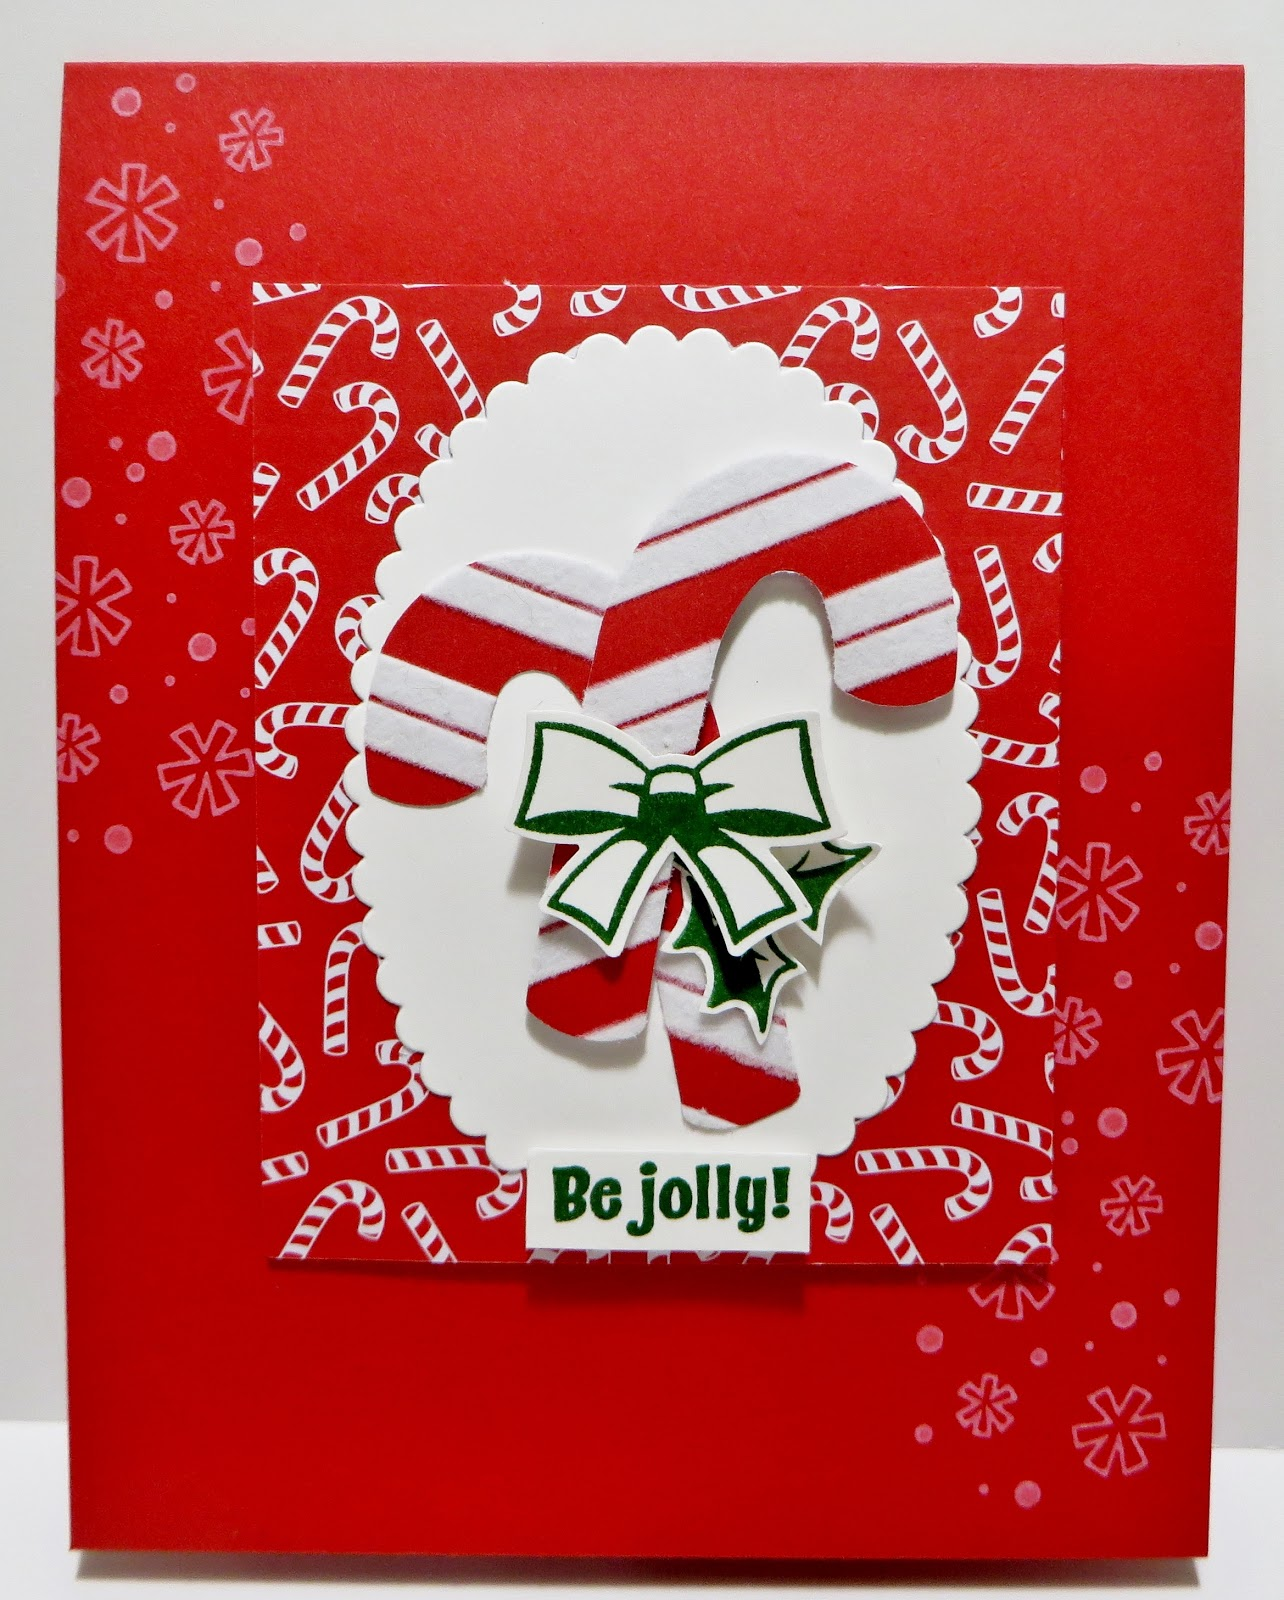 Lynn S Locker Sneak Peek Santa S Workshop Candy Cane Season Candy Cane Punch Layering Ovals Christmas Card